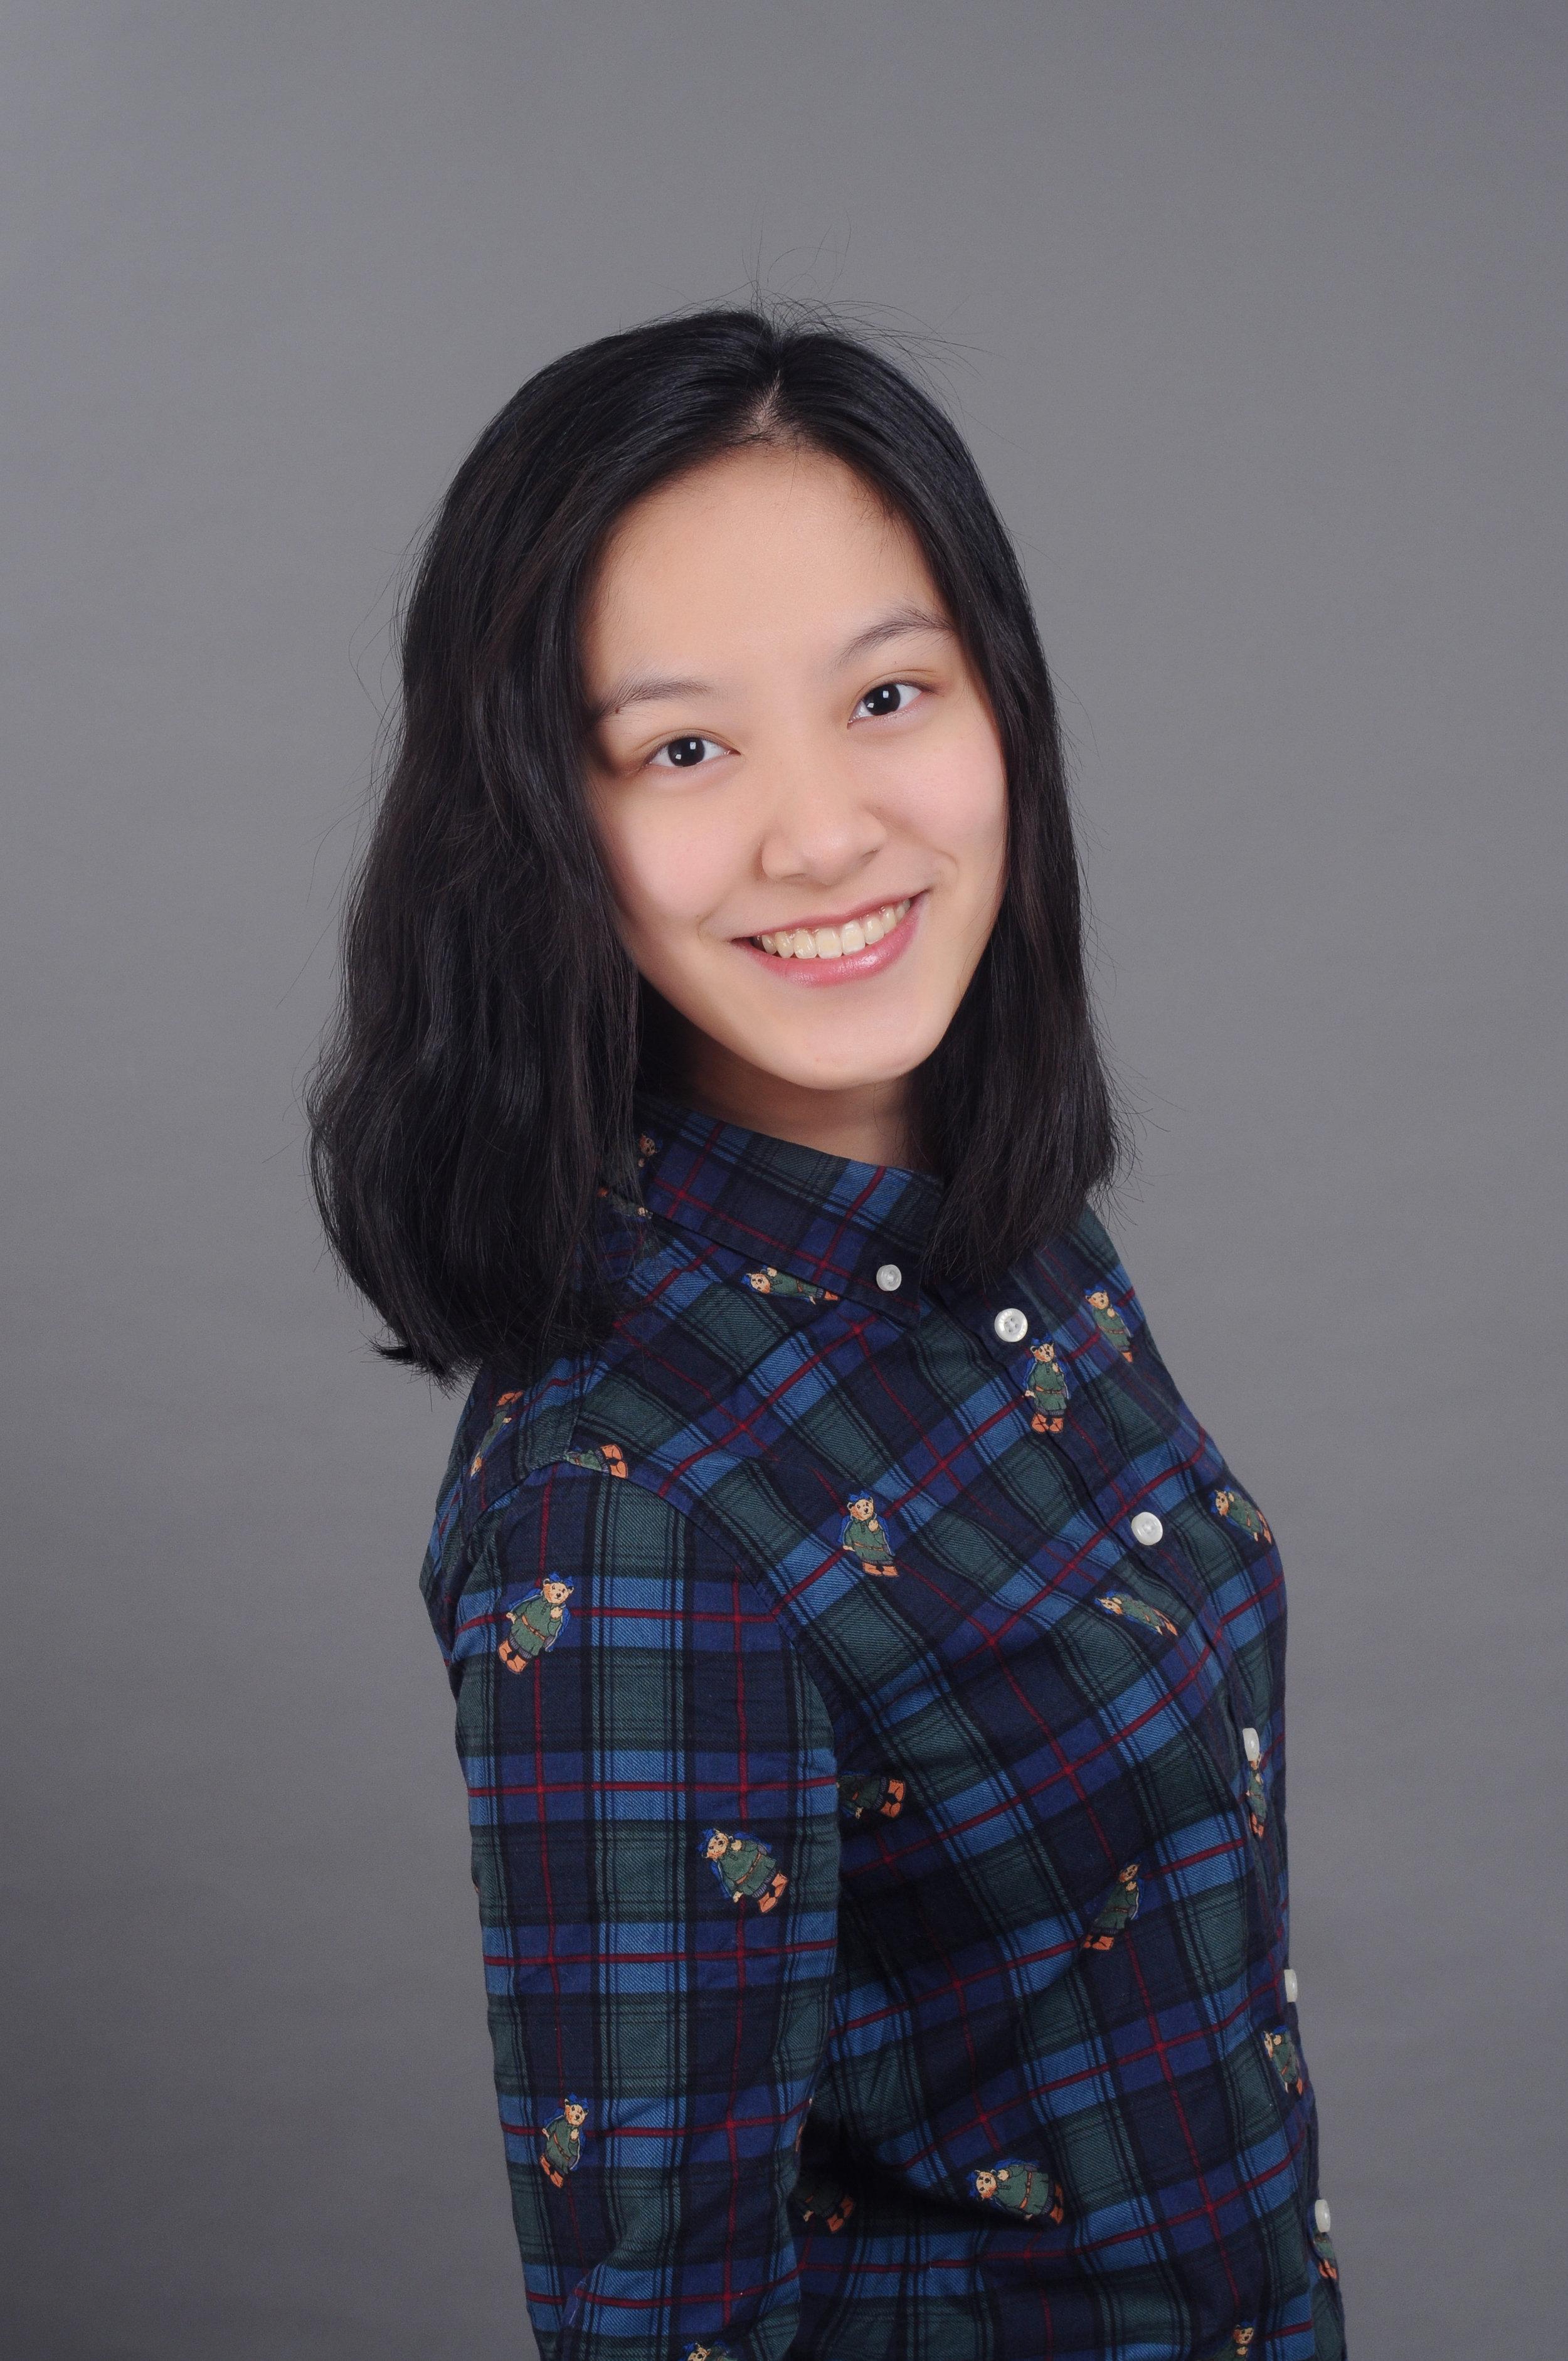 DSC_8843 - Alice Chen.JPG